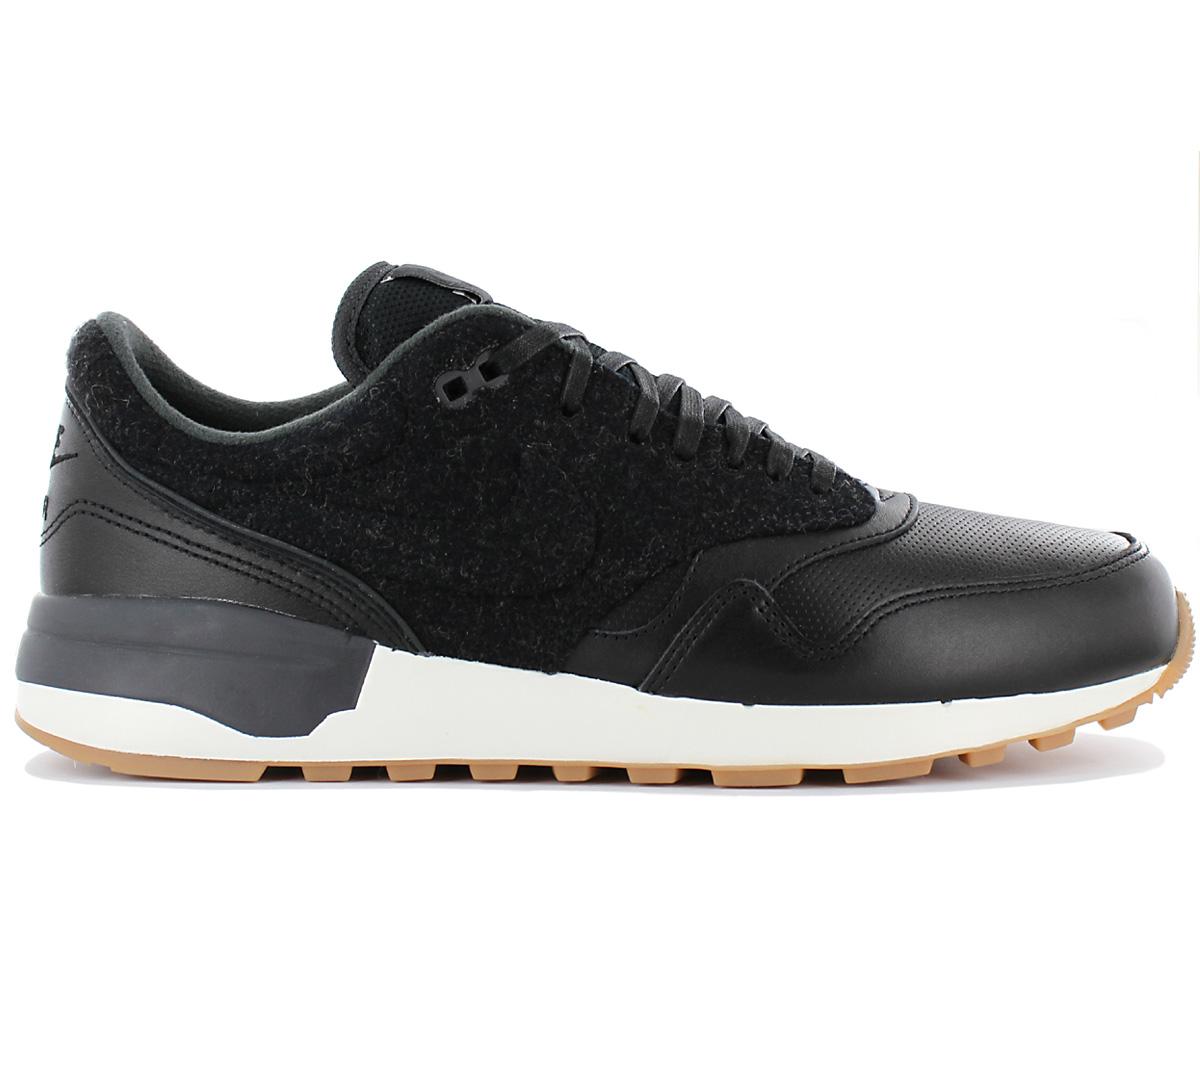 Nike Air Odyssey LX Sneaker Sportschuh Turnschuh Leder